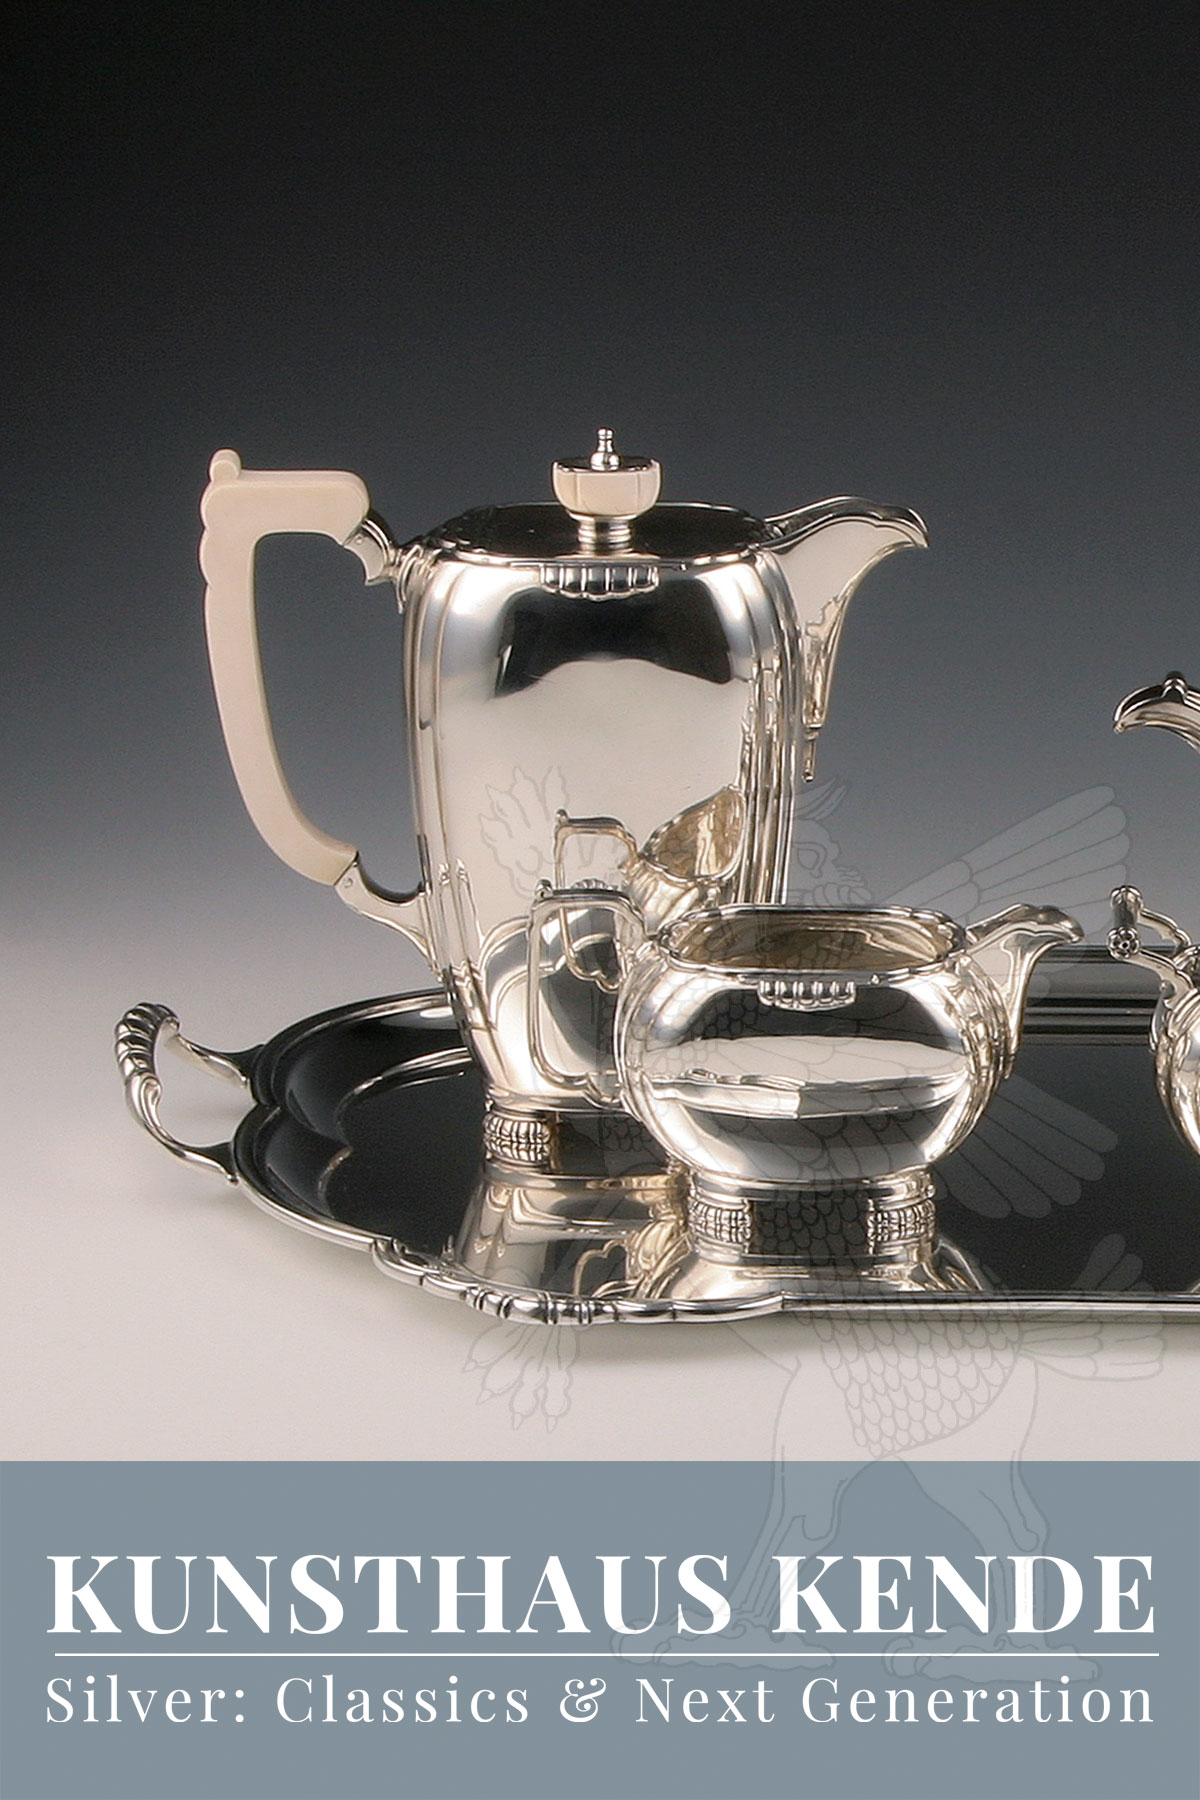 silber teekanne sterling silber englische tee kaffeekanne silber 925 tablett